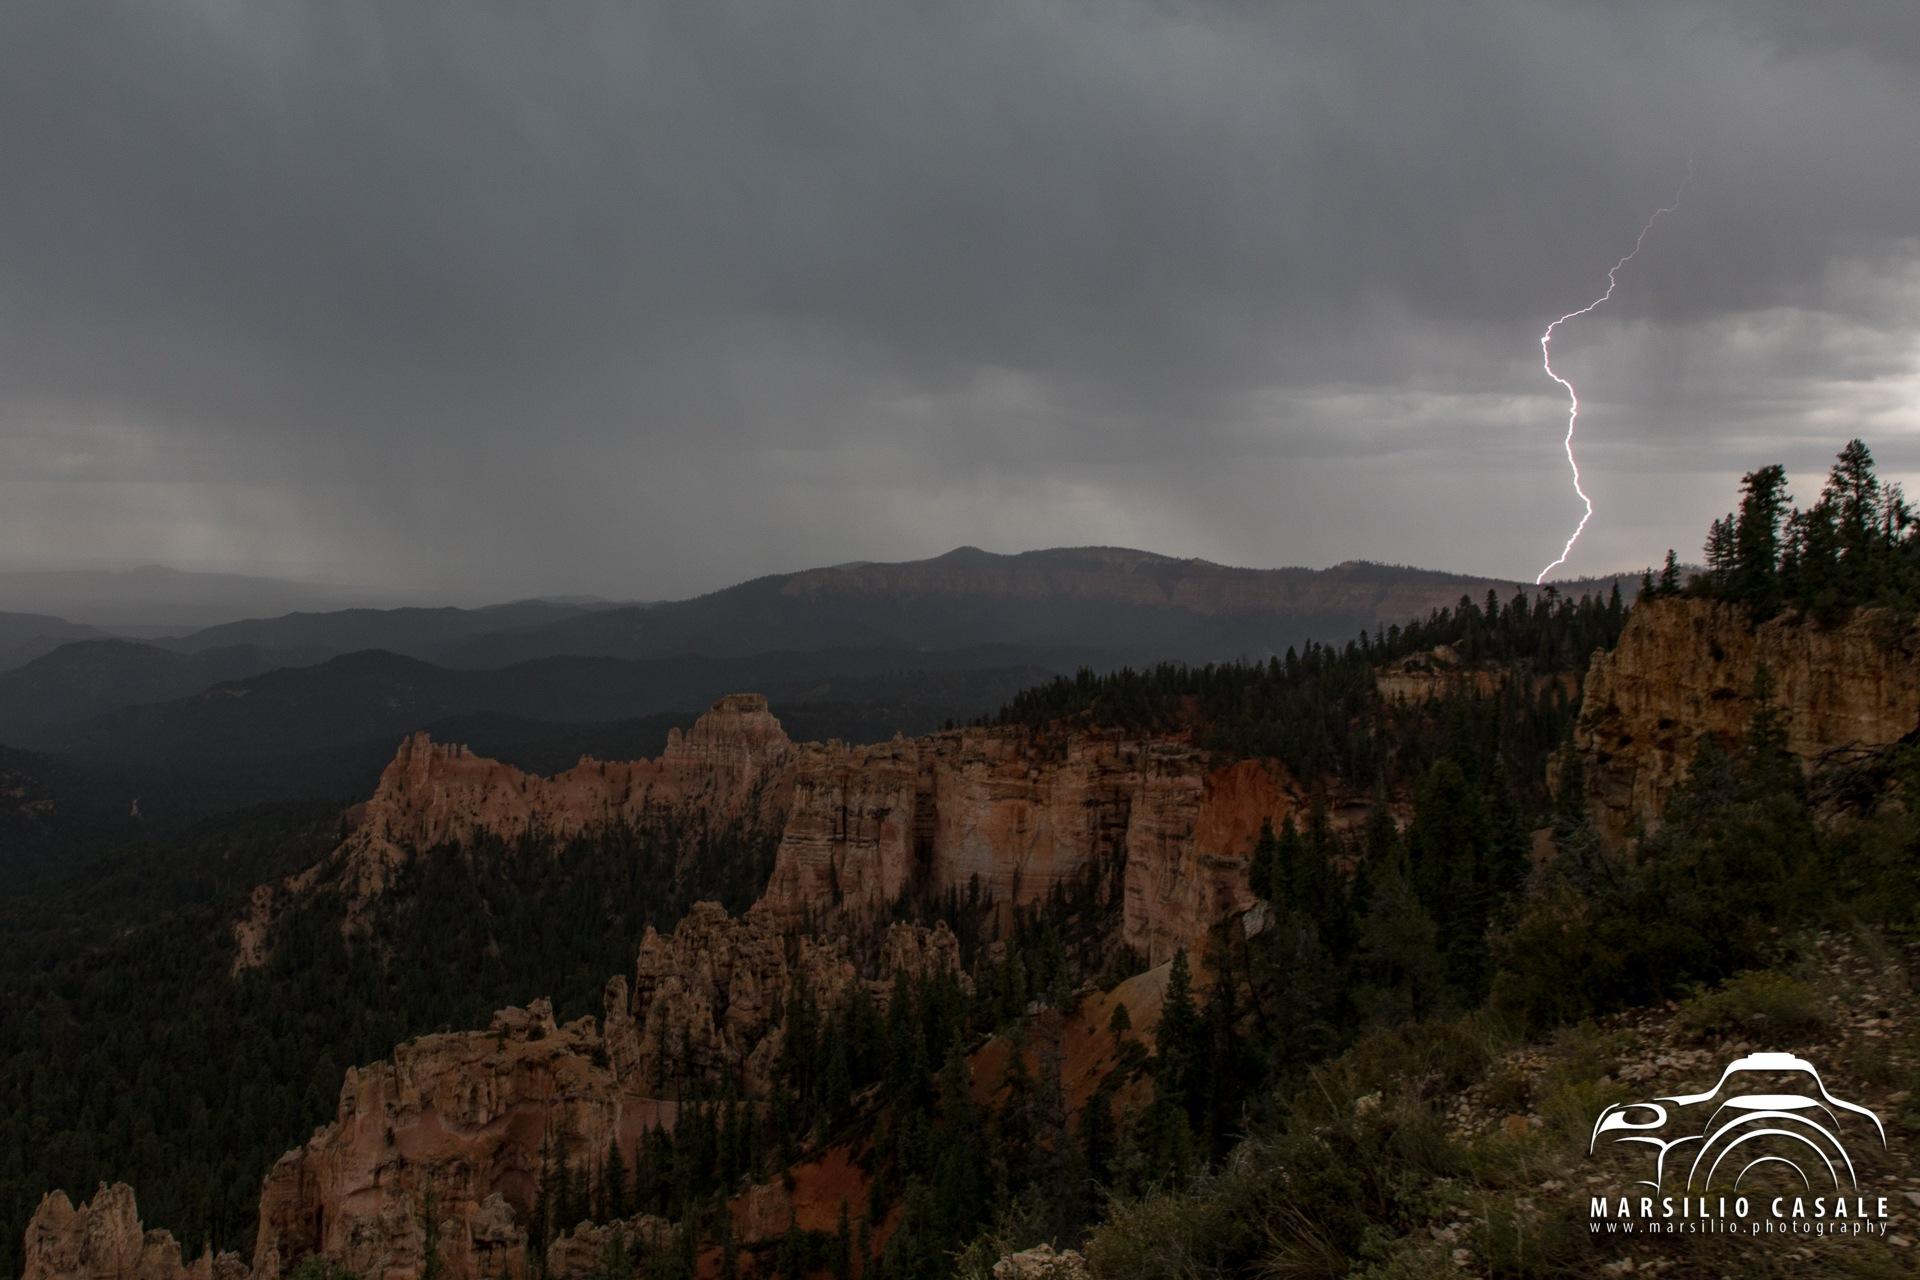 Thunderstorm by Marsilio Casale